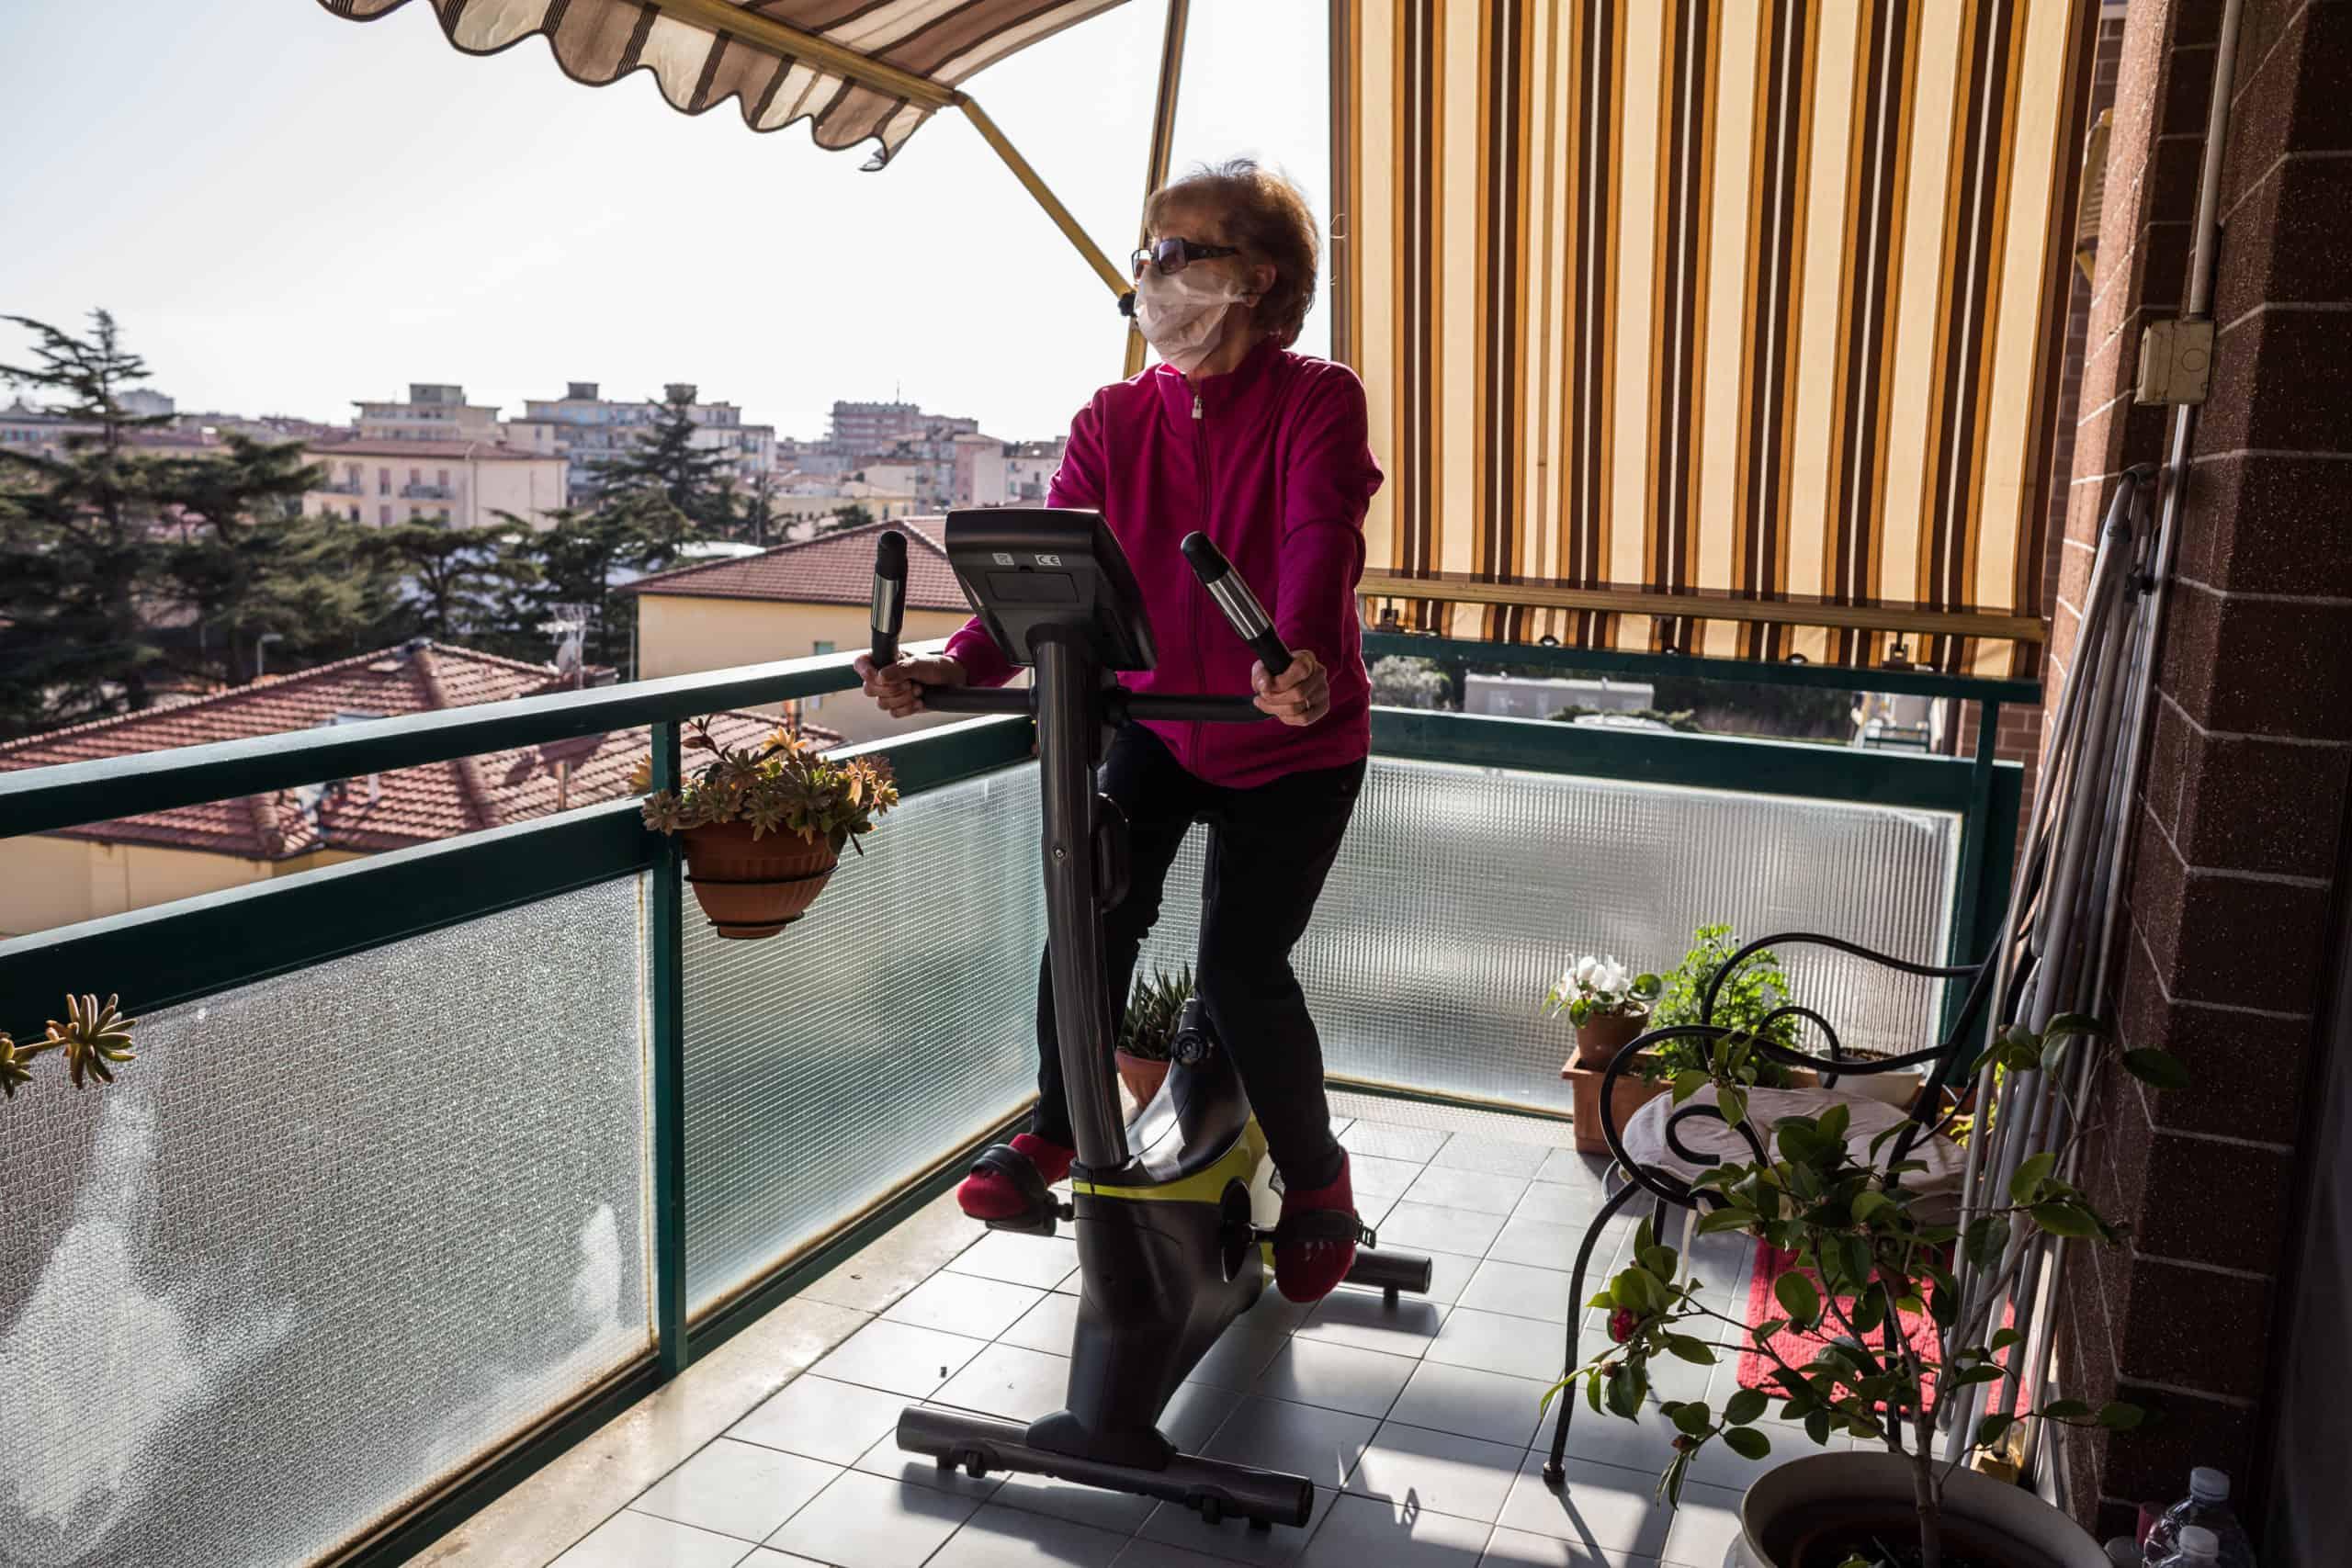 Stefania fährt Rad (© Giacomo Sini).